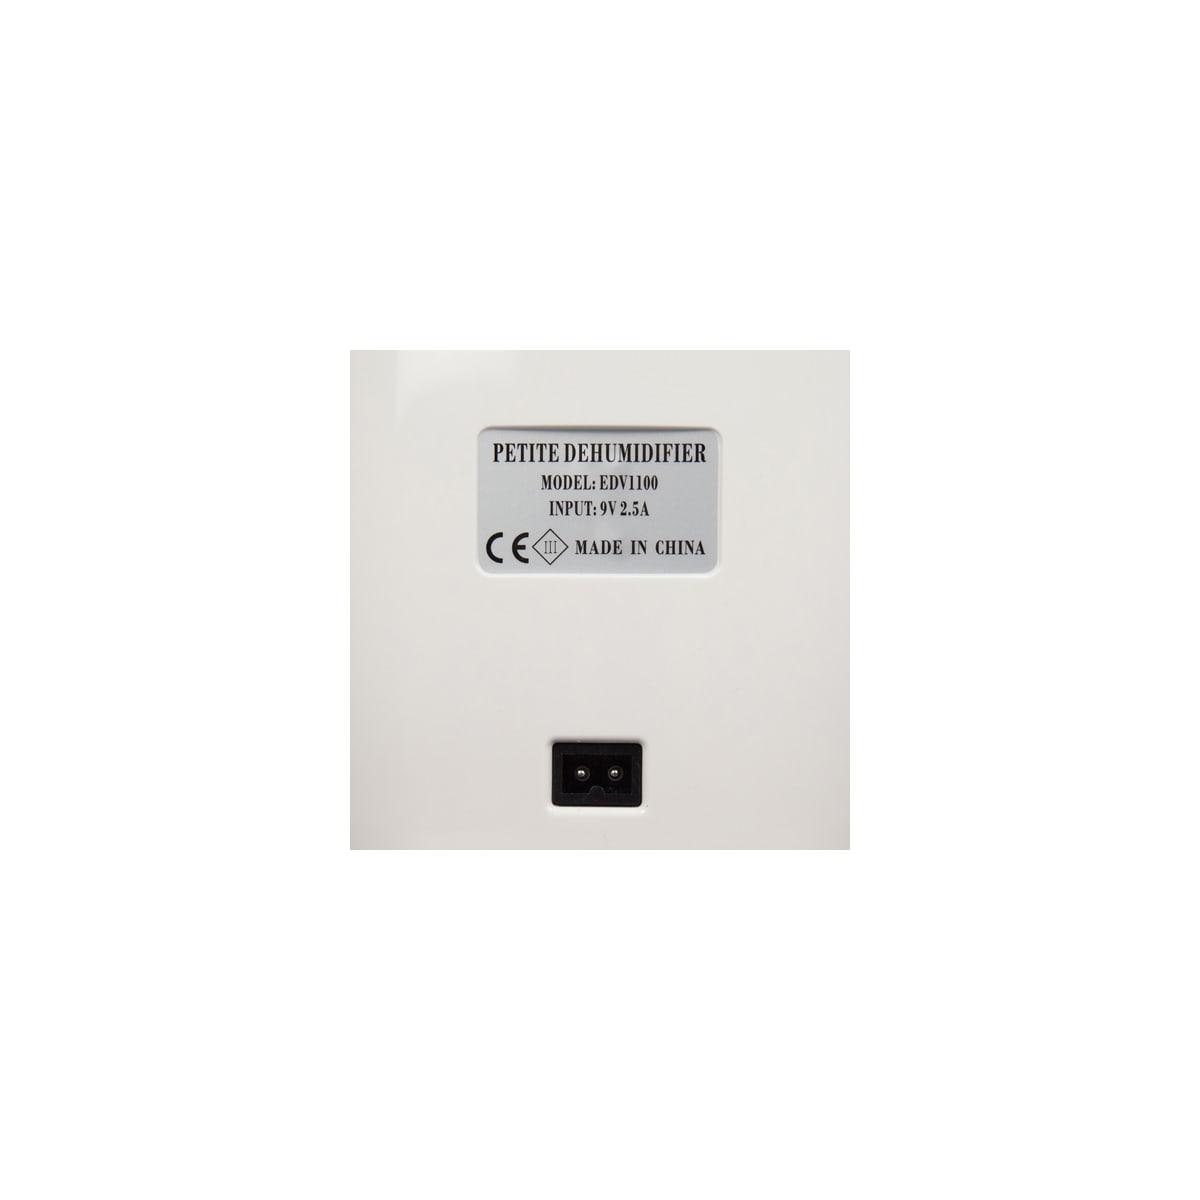 Edv 1100 Eva Dry Electric Petite Dehumidifier